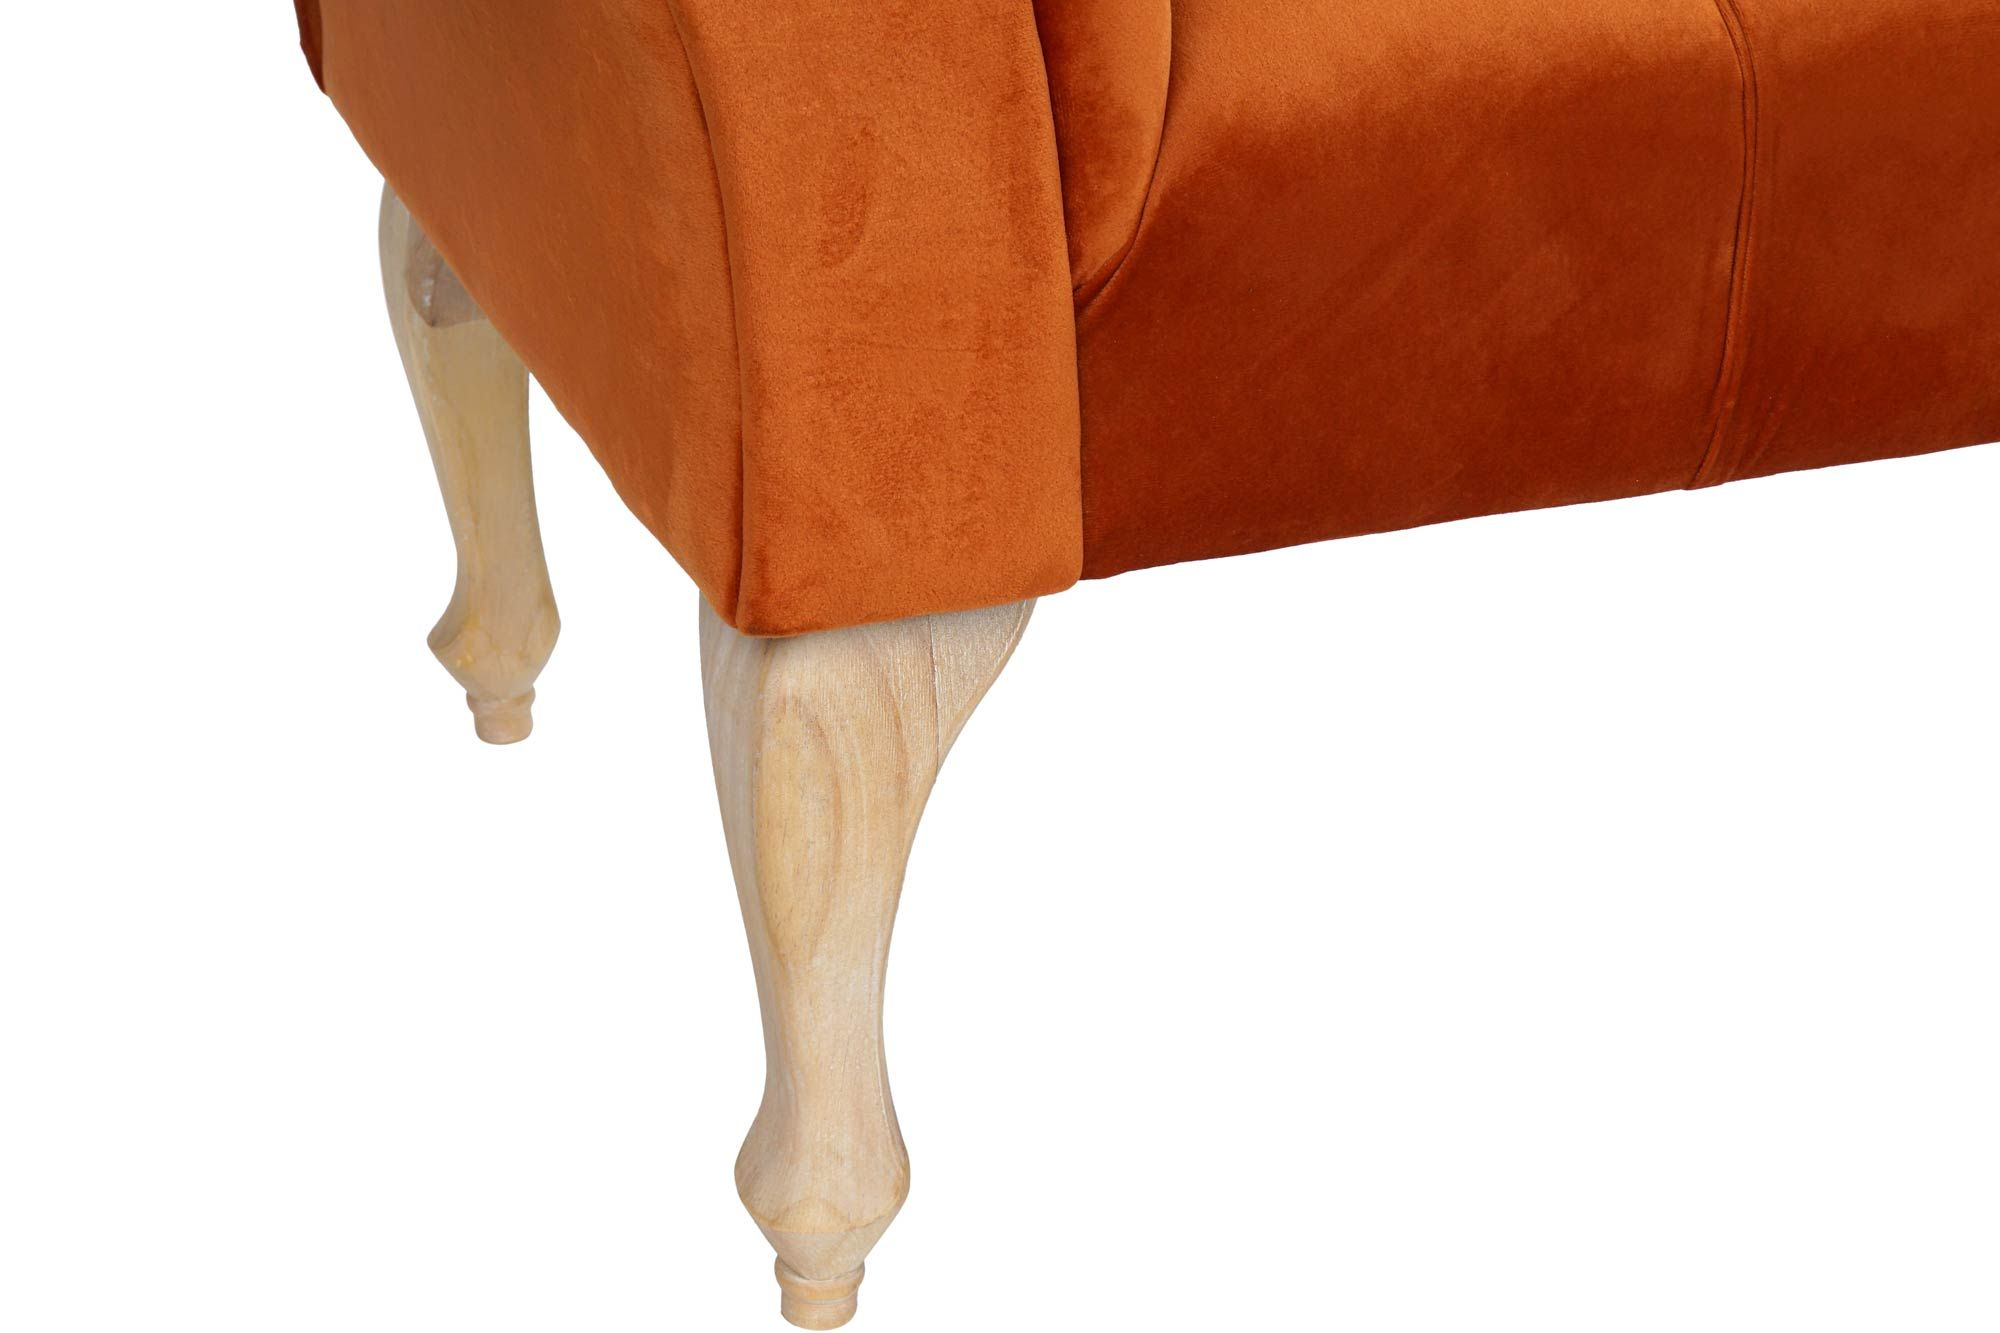 30091-chaiselongue-terciopelo-naranja-tostado-3.jpg